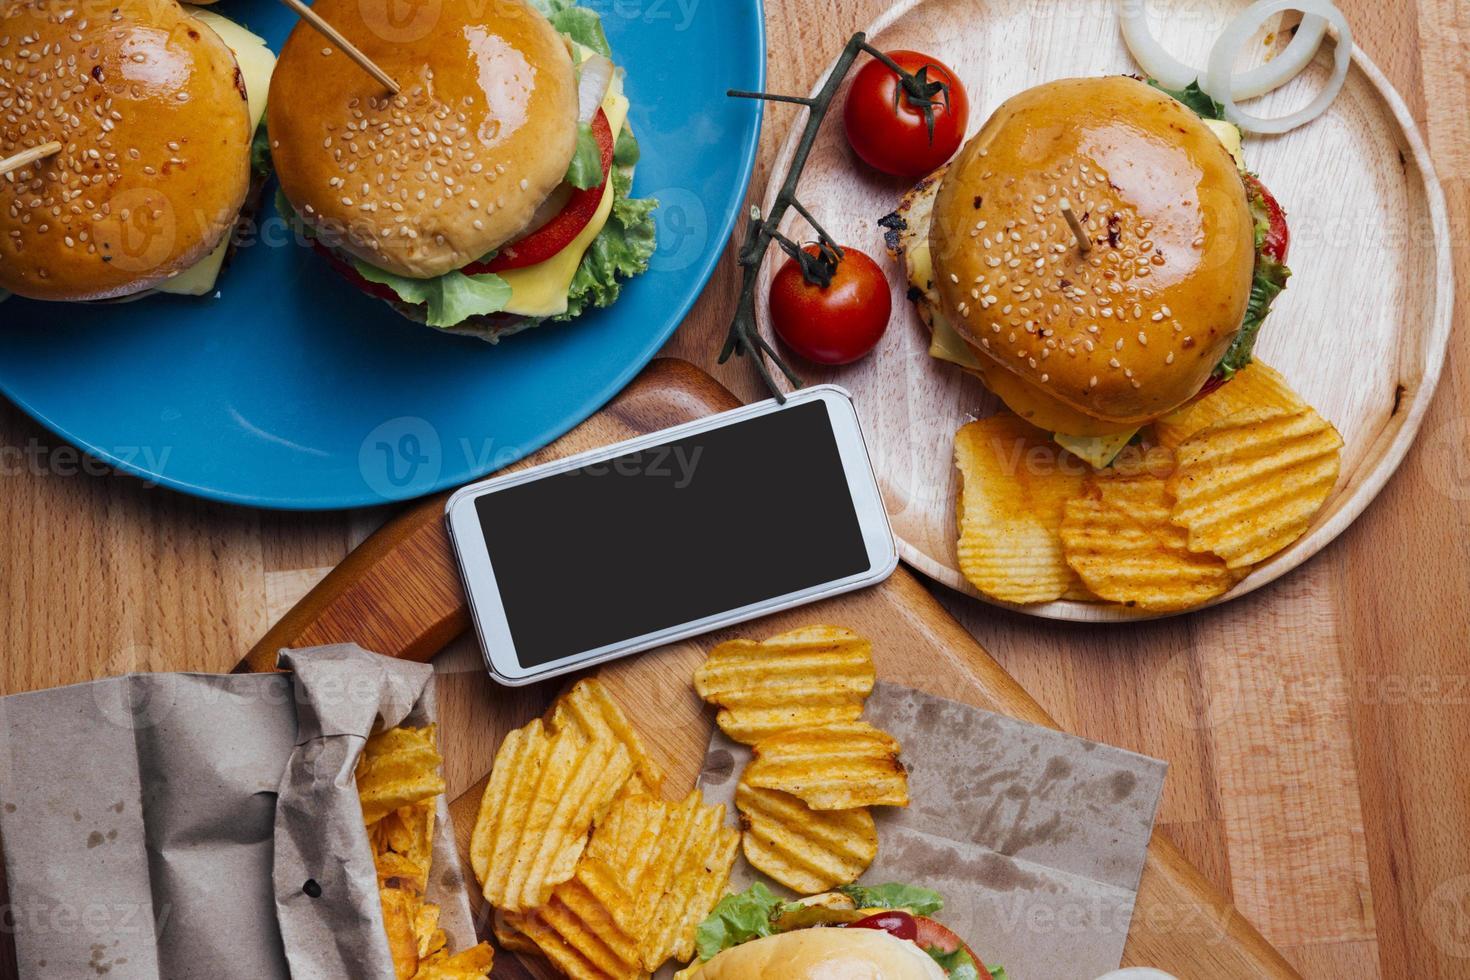 Hamburger mit Moblie-Telefon foto